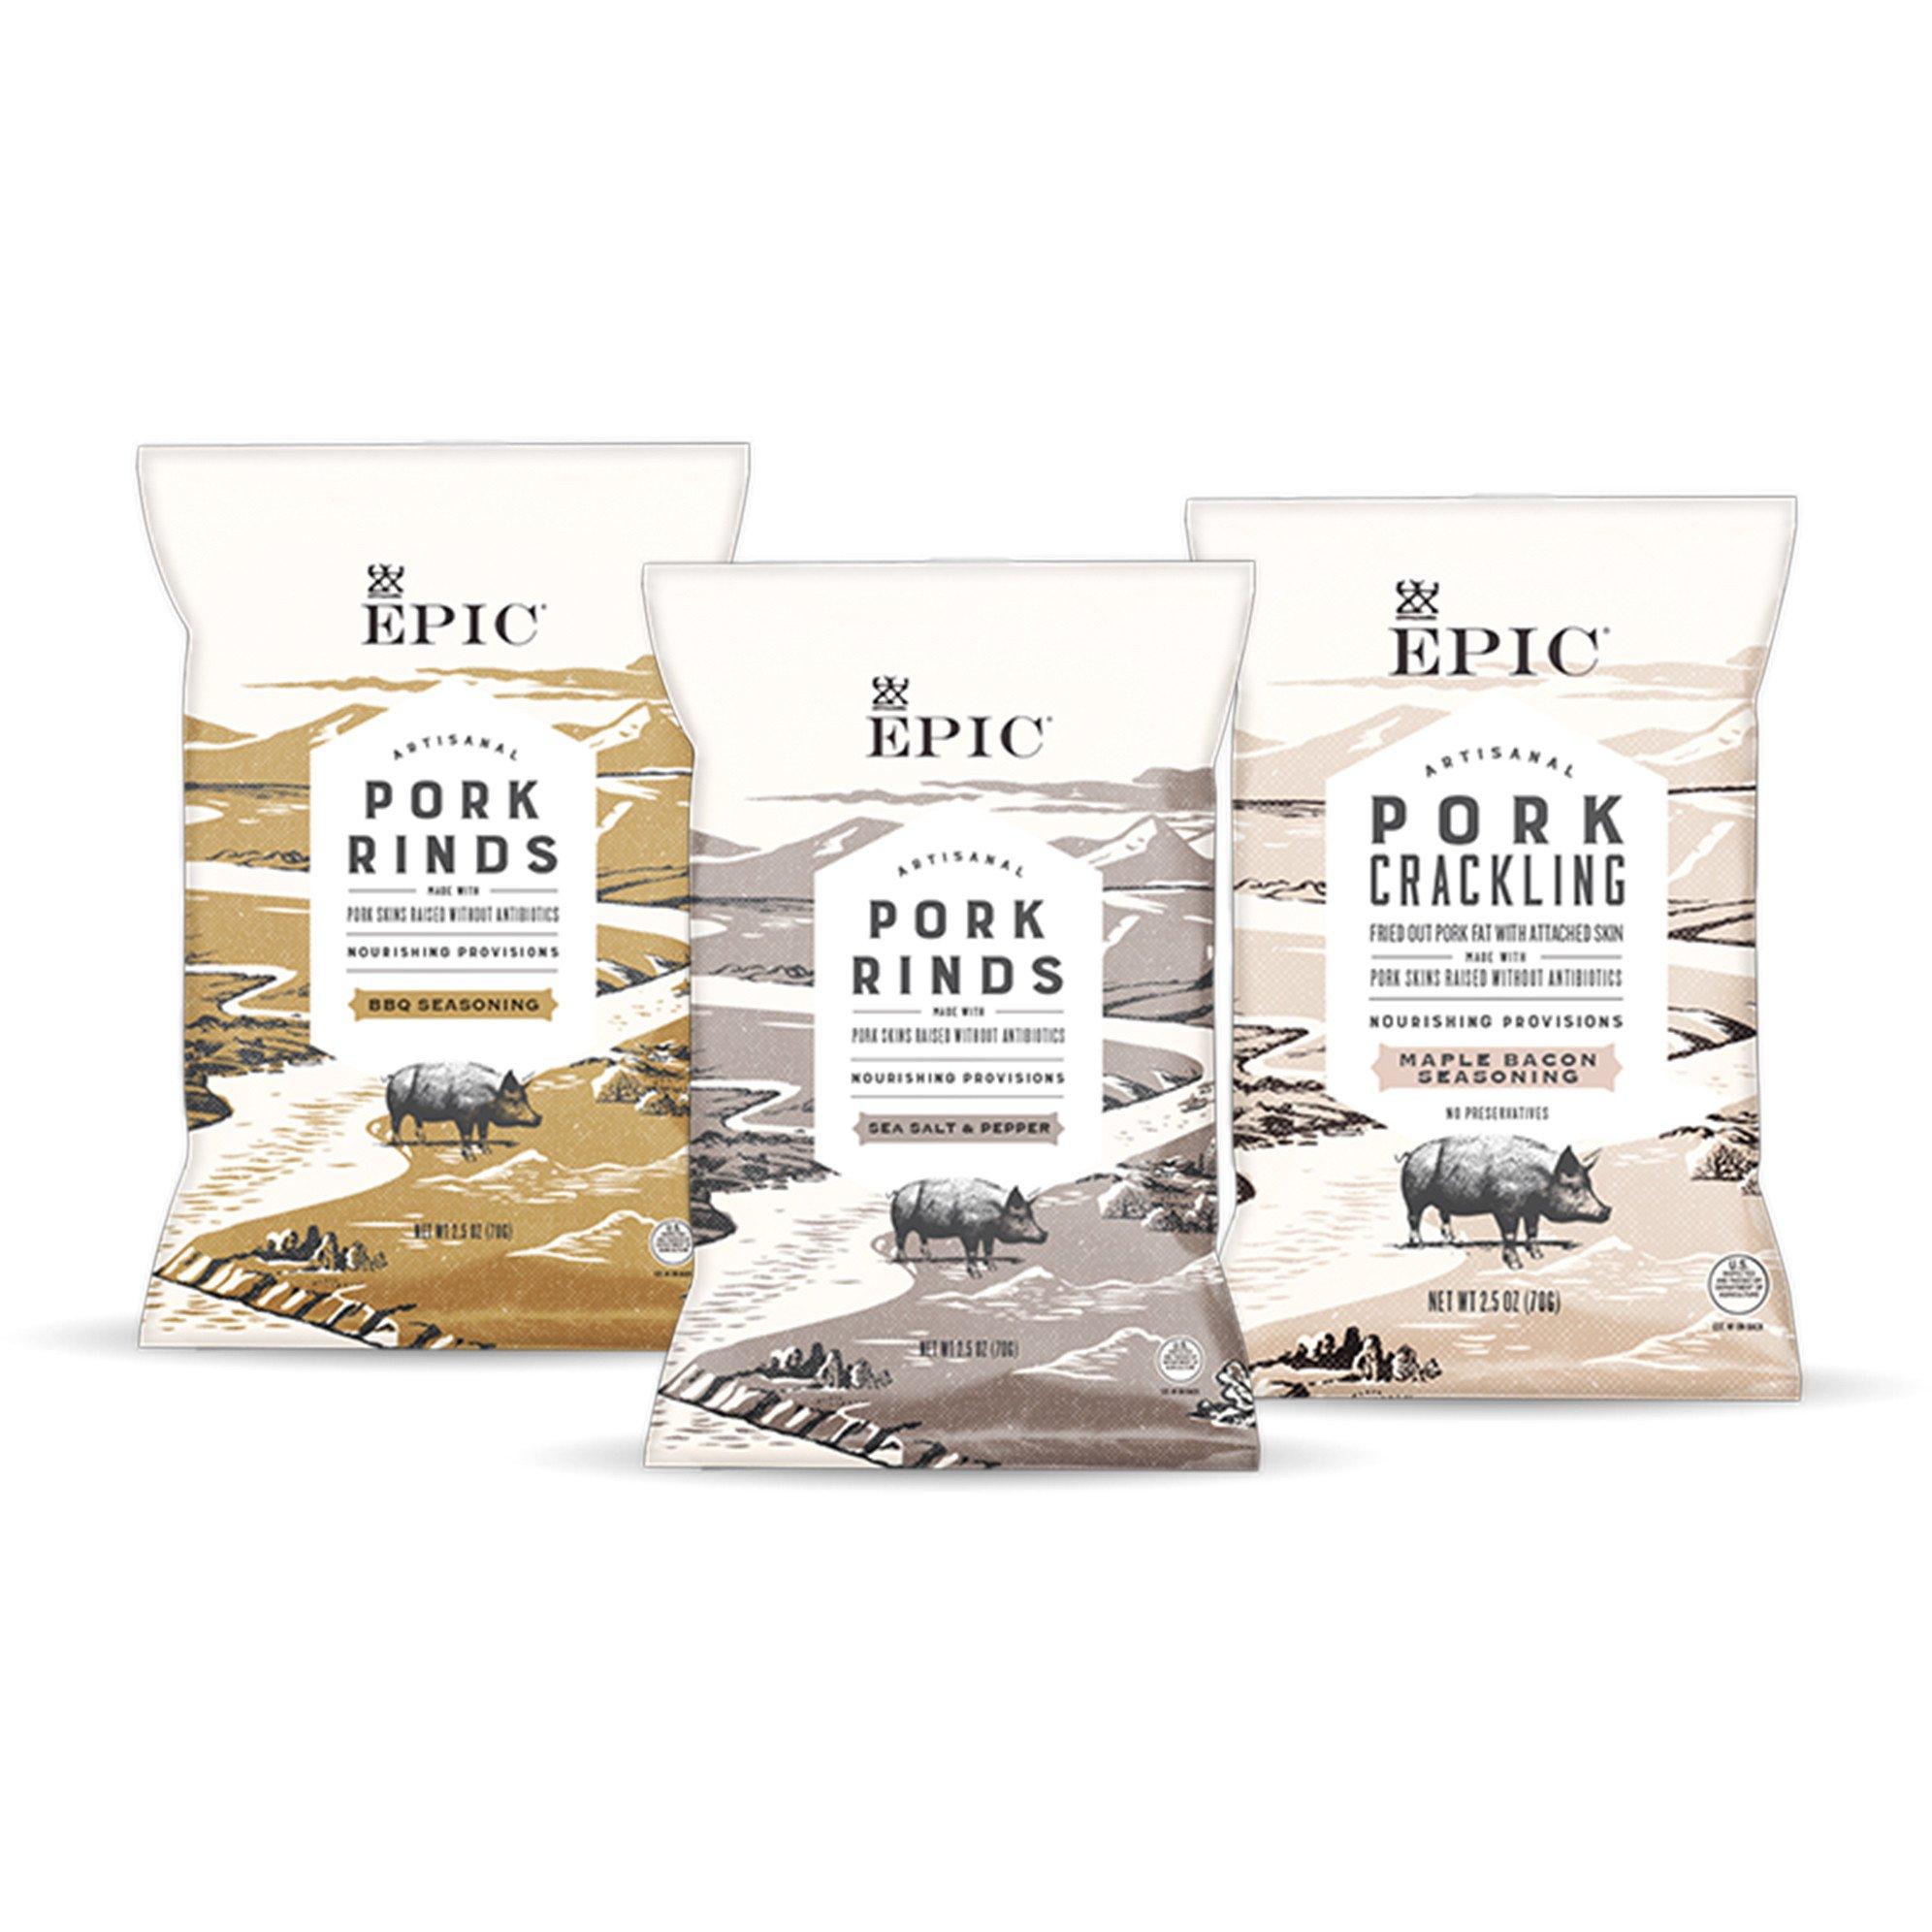 EPIC Artisanal Pork Rinds Snack, Sea Salt and Pepper, BBQ Seasoning, Maple Bacon, 2.5 ounce (Assortment)